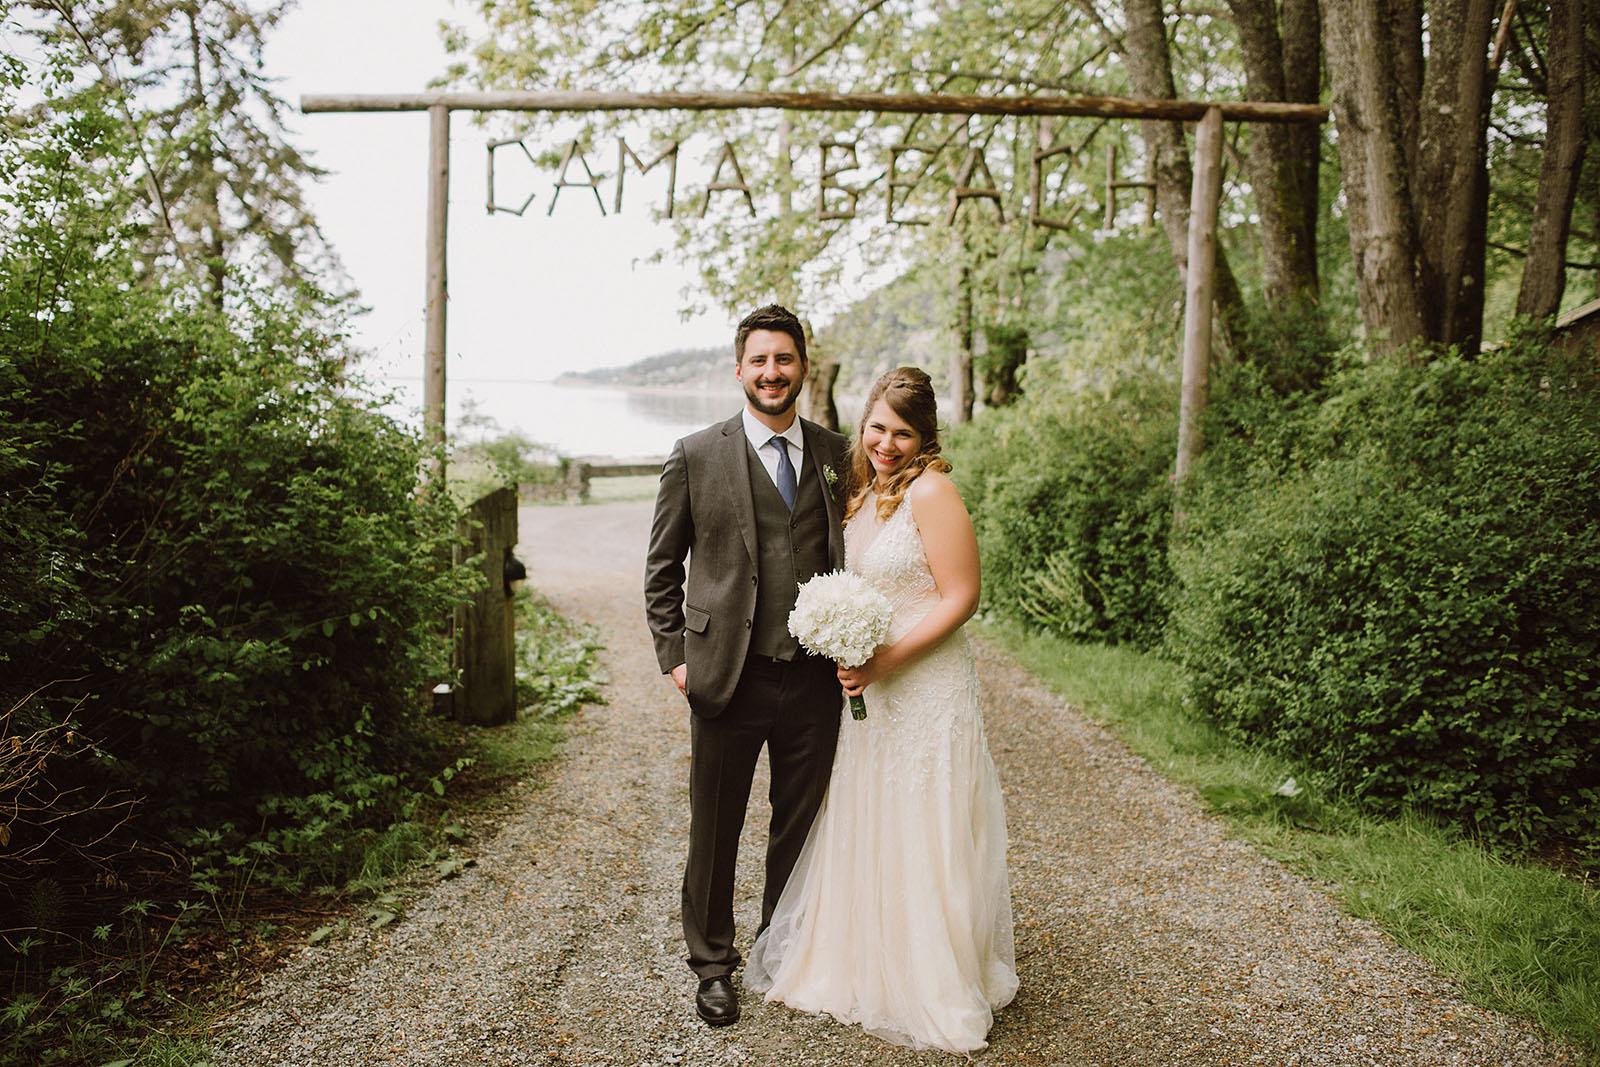 Bride and Groom at Cama Beach State Park | Camano Island Wedding